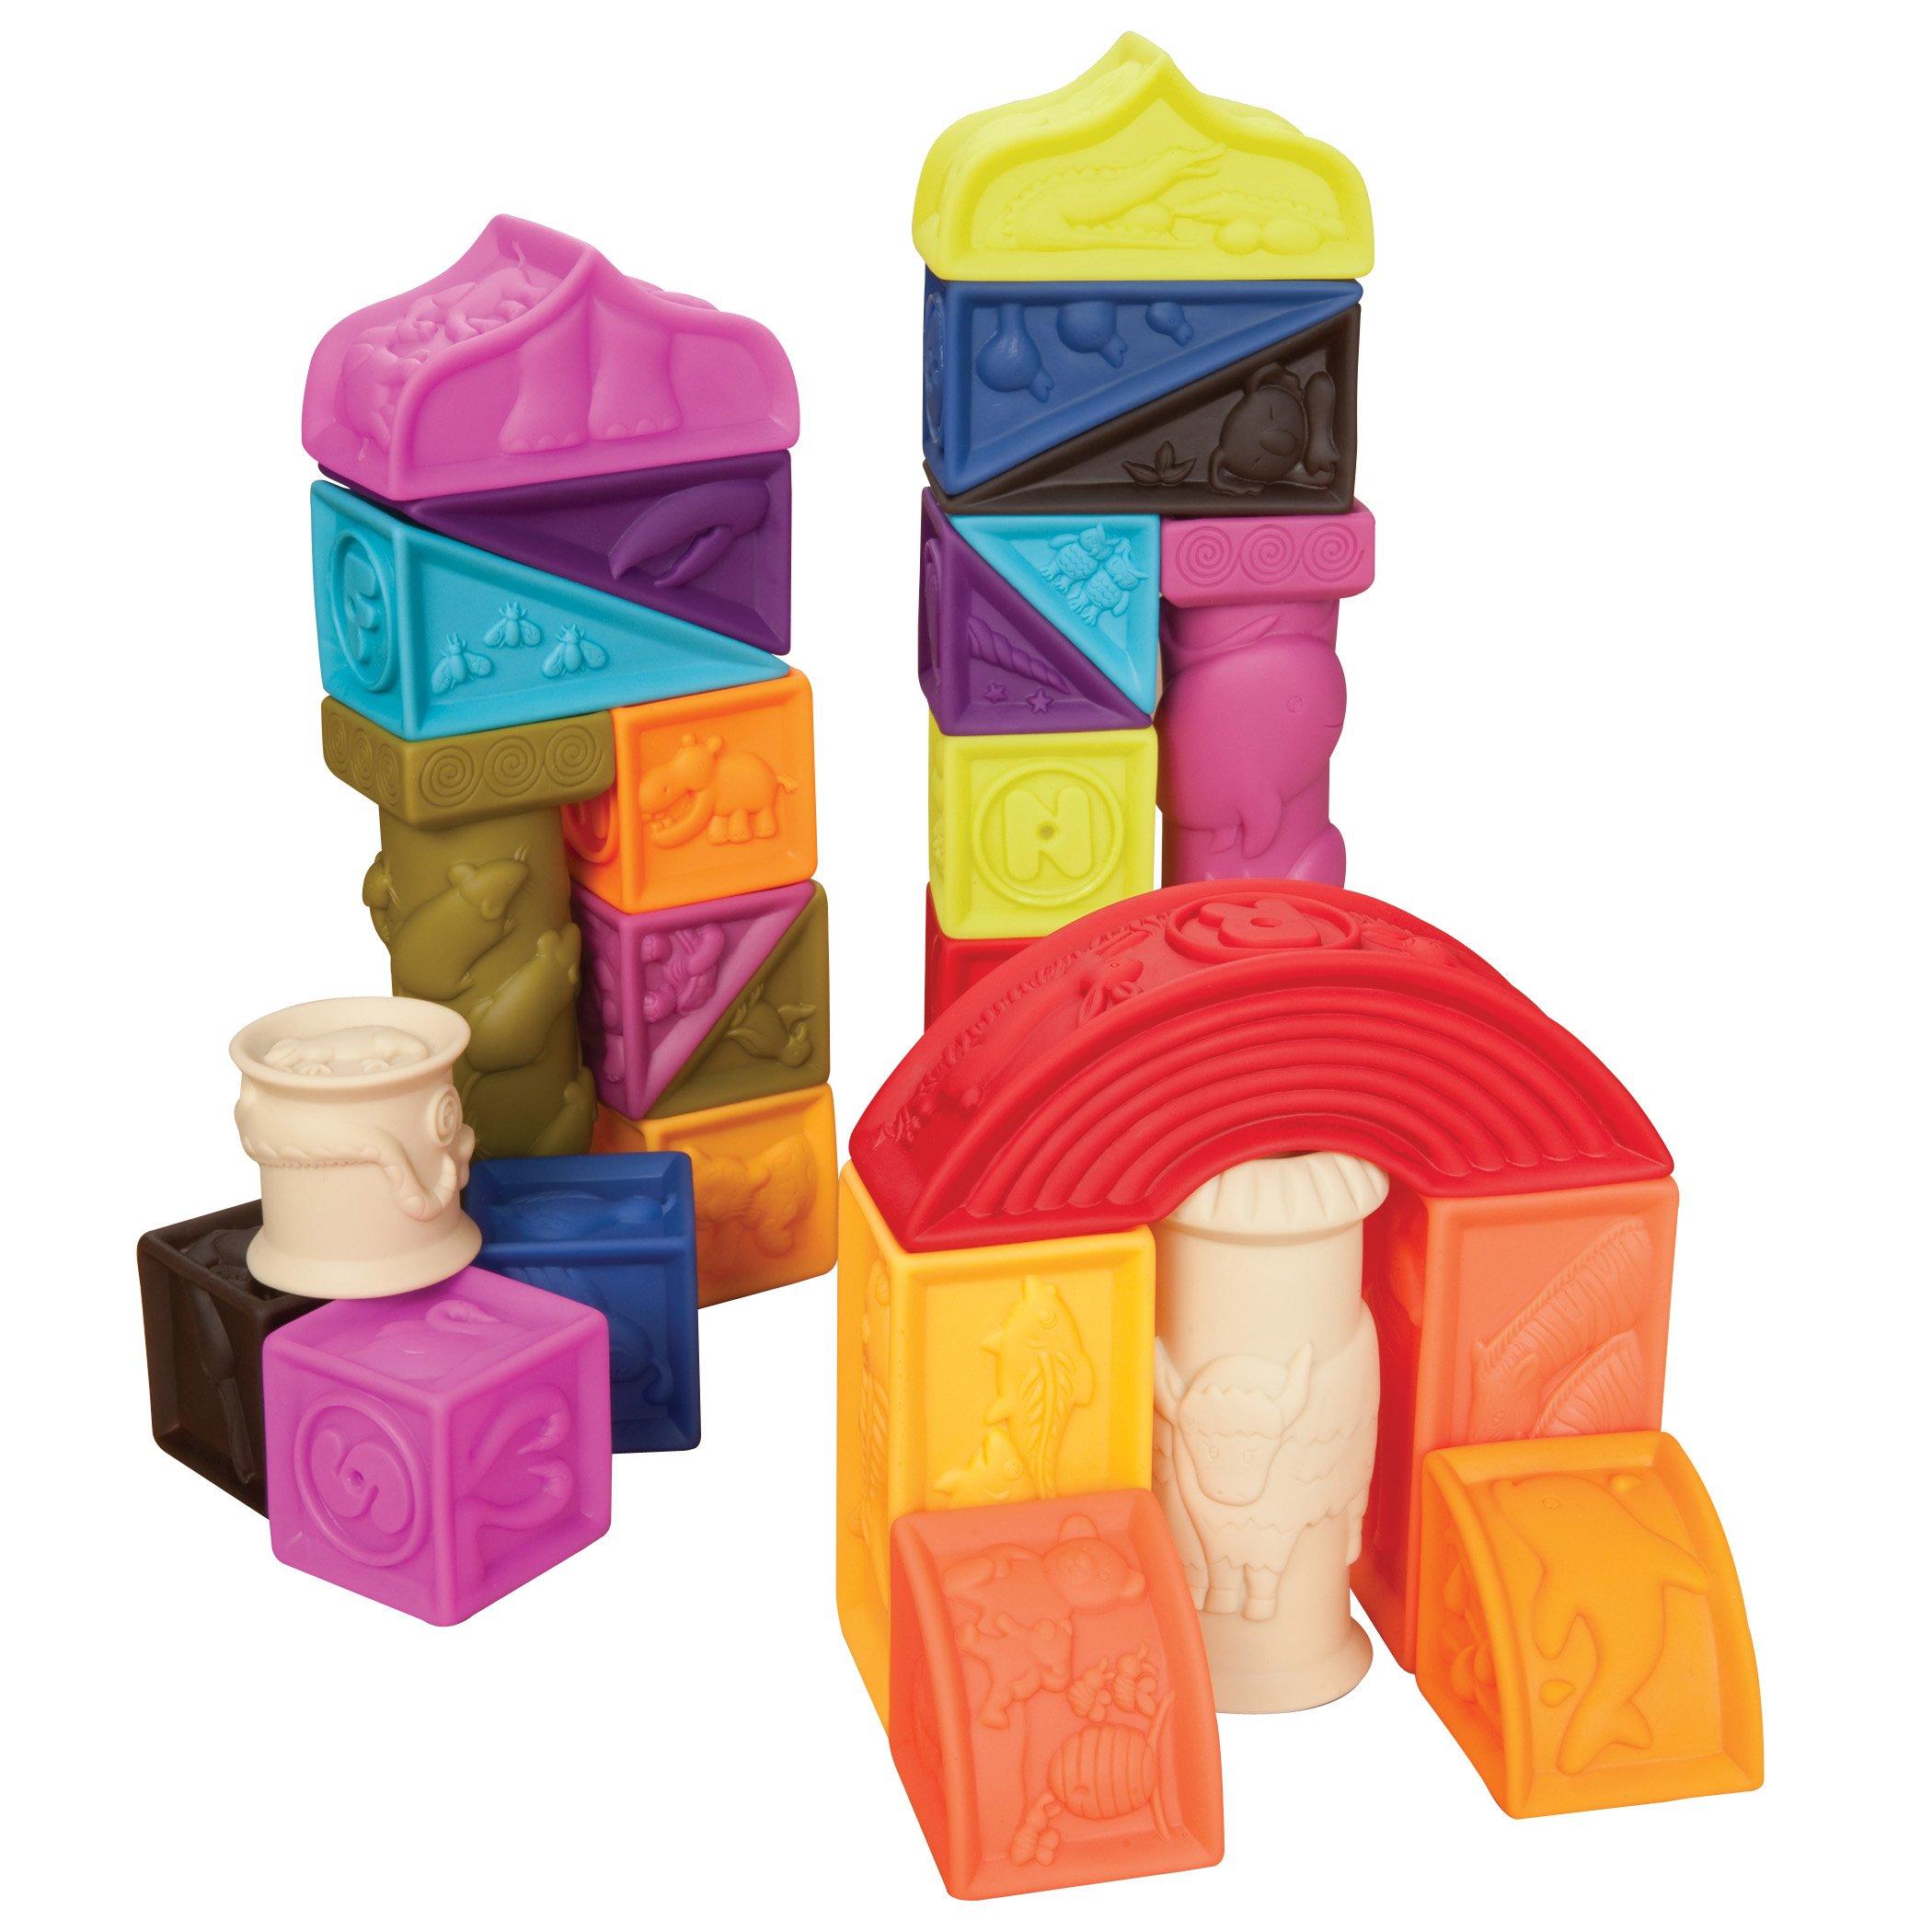 B.Toys Elemenosqueeze A到Z建筑积木块